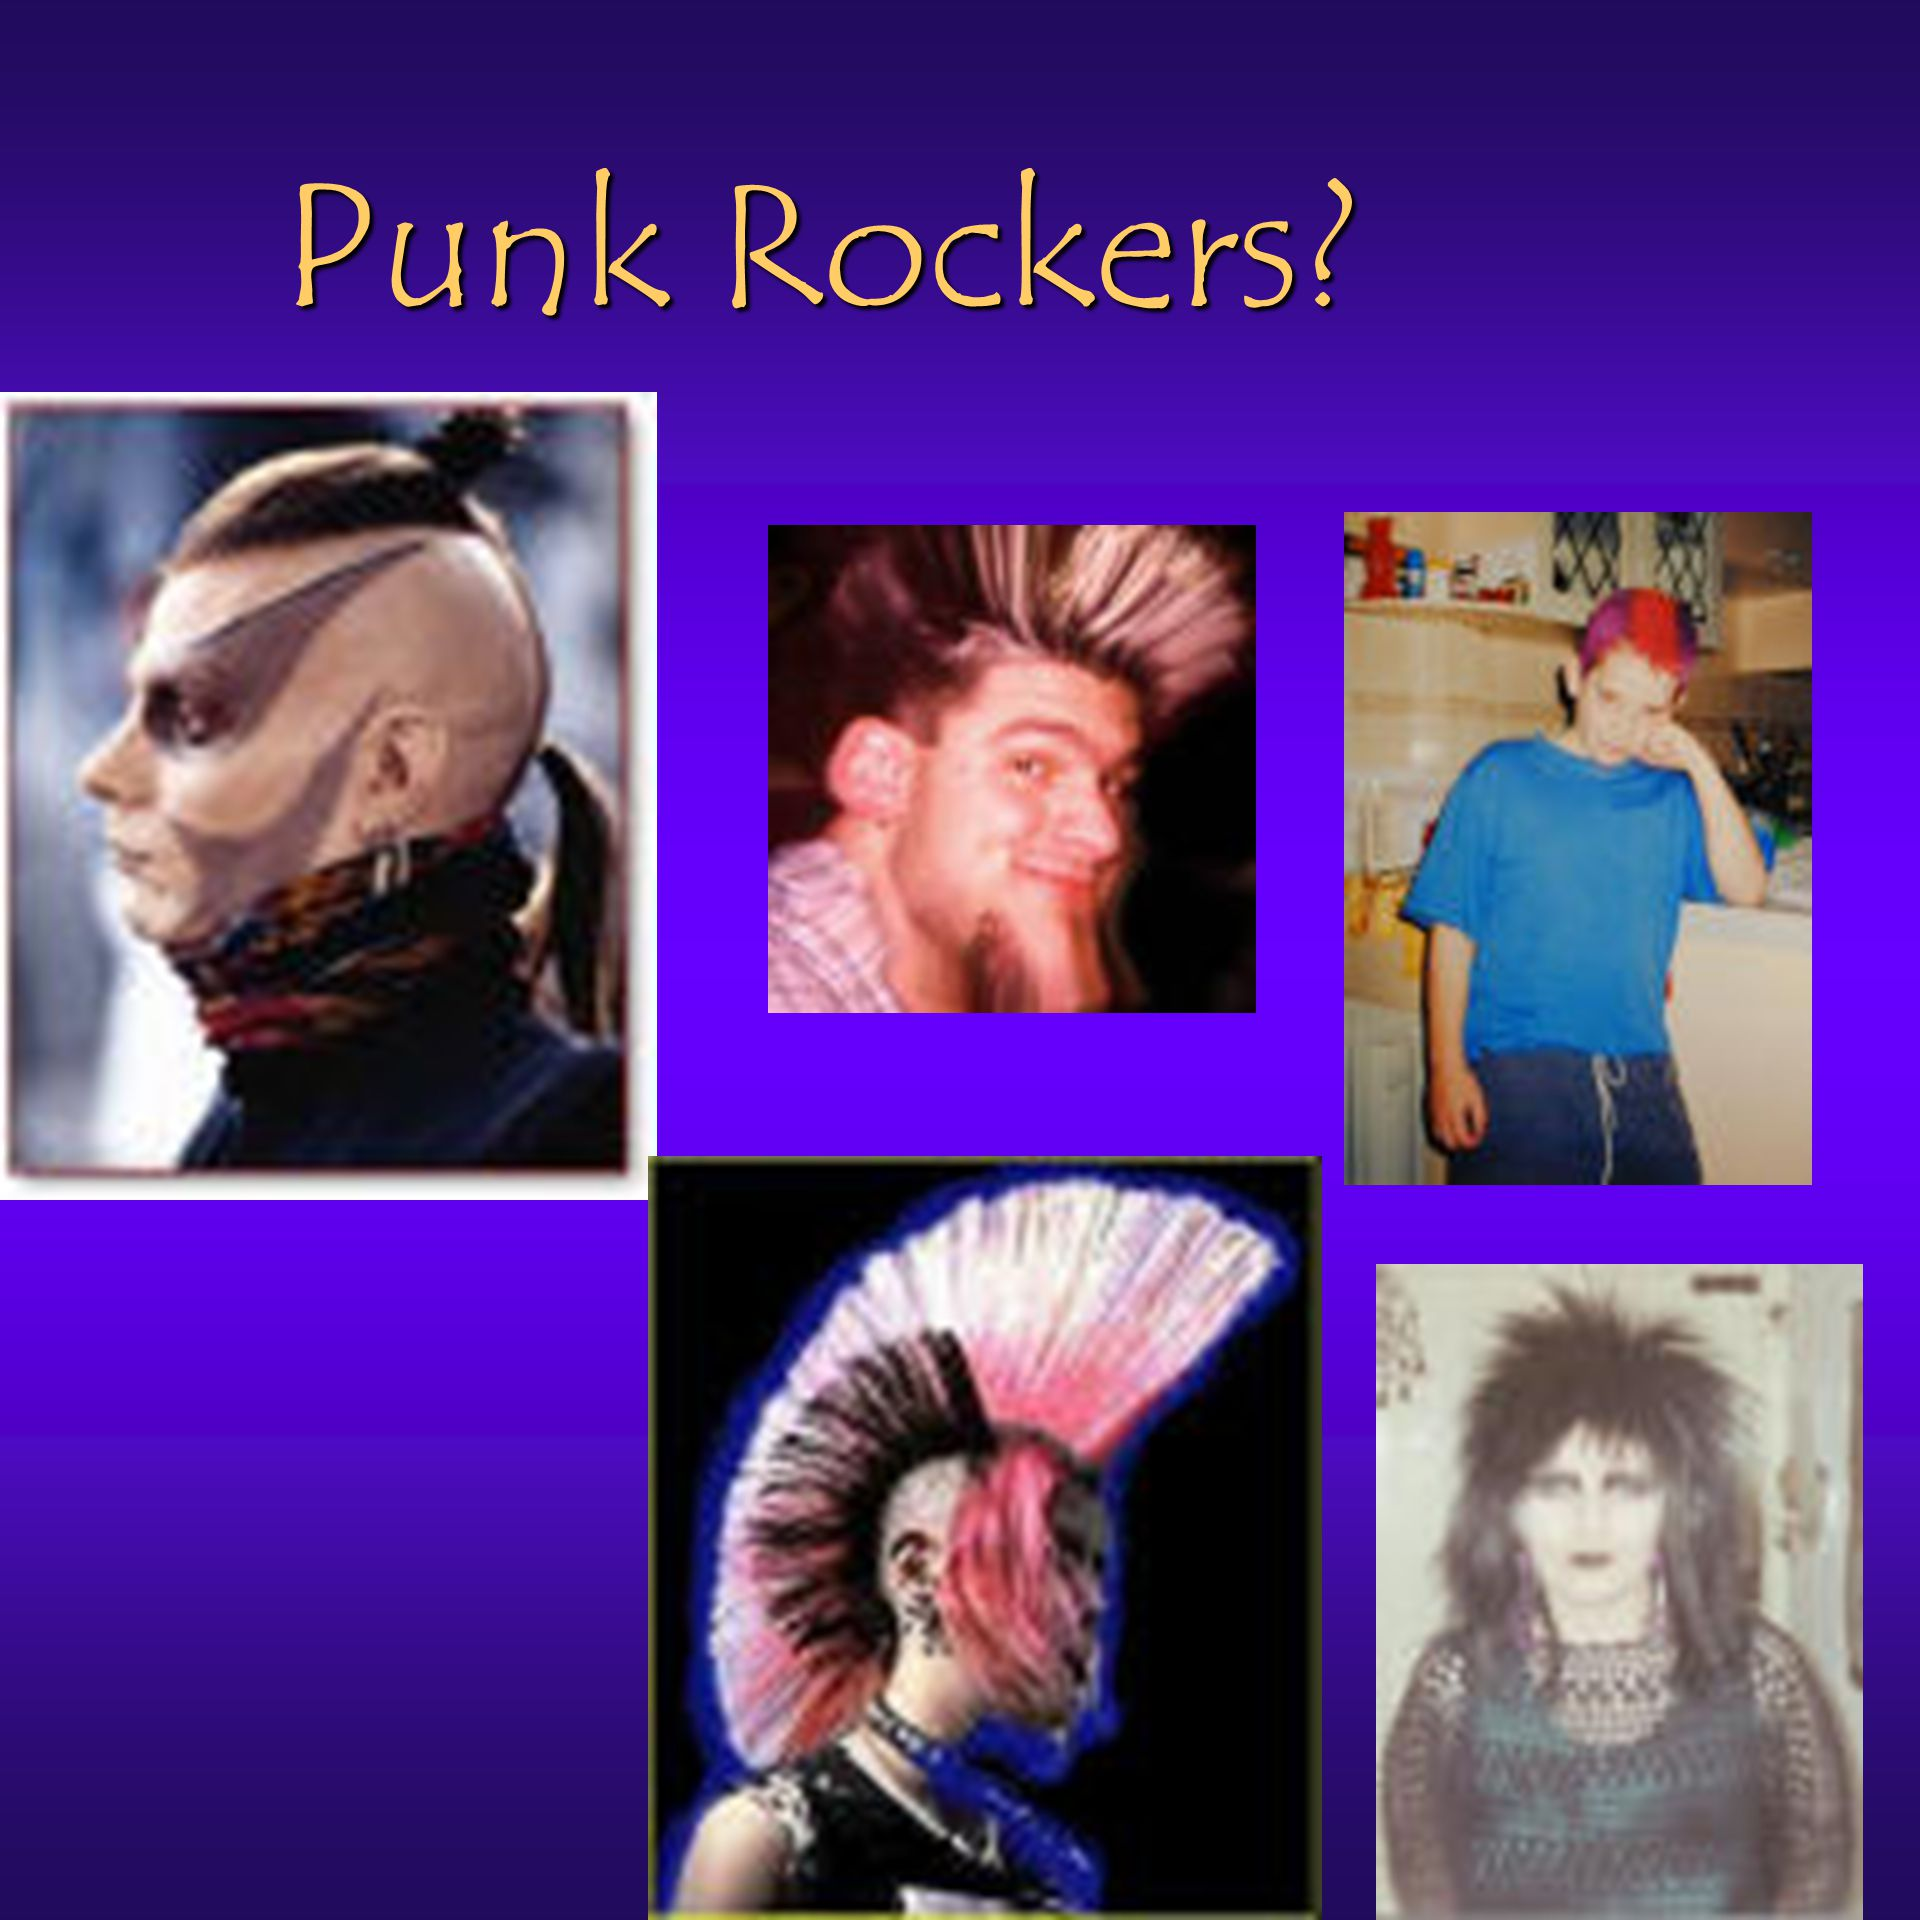 Punk Rockers?